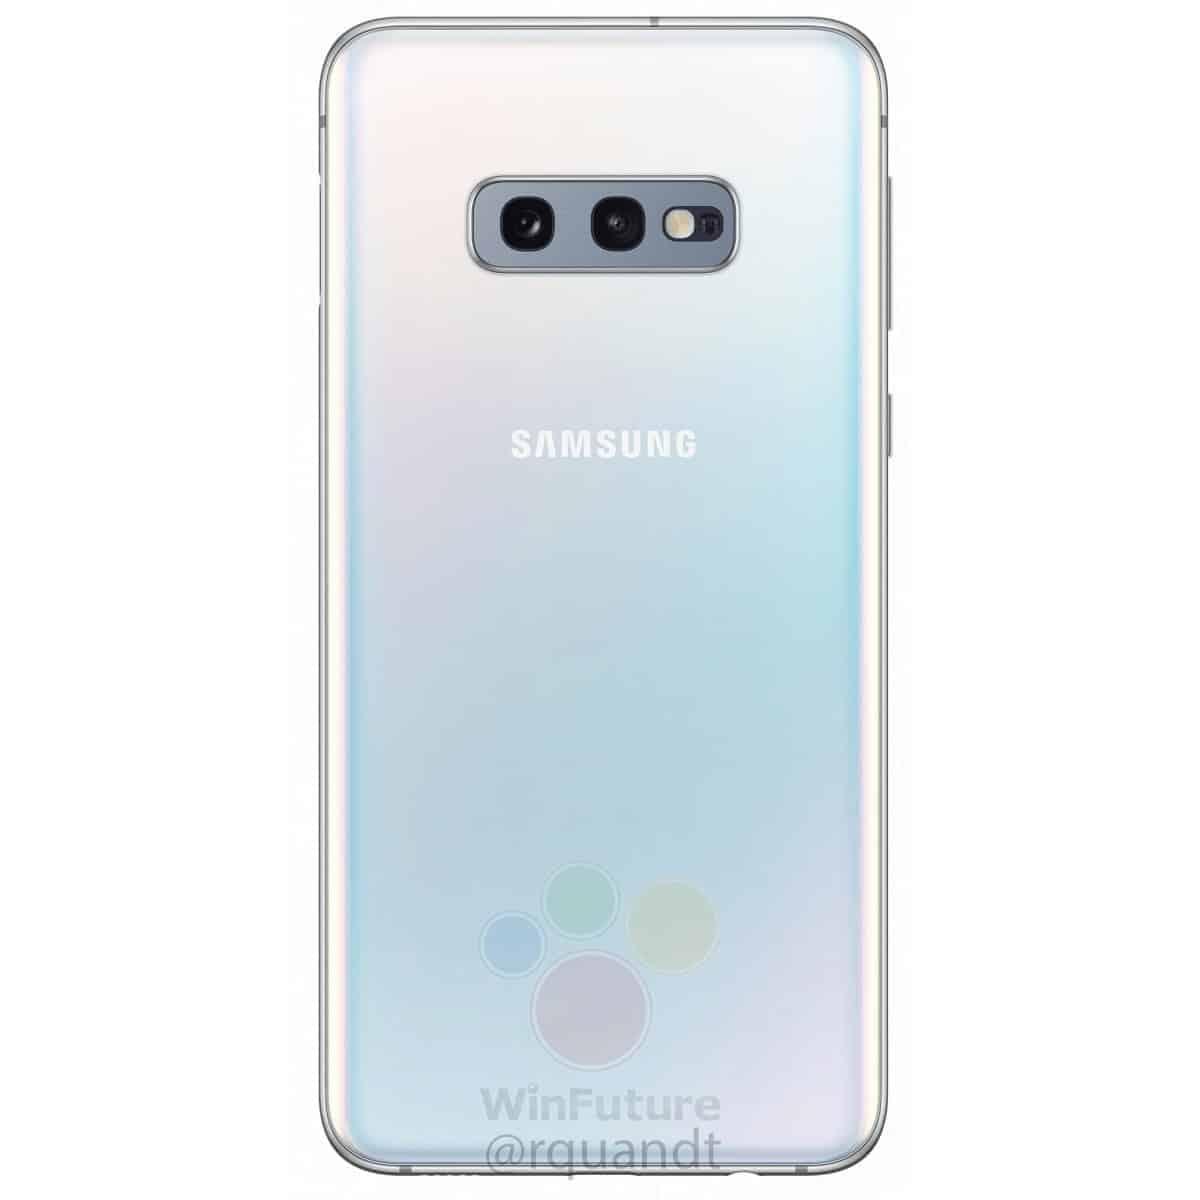 Samsung Galaxy S10e render leak 2